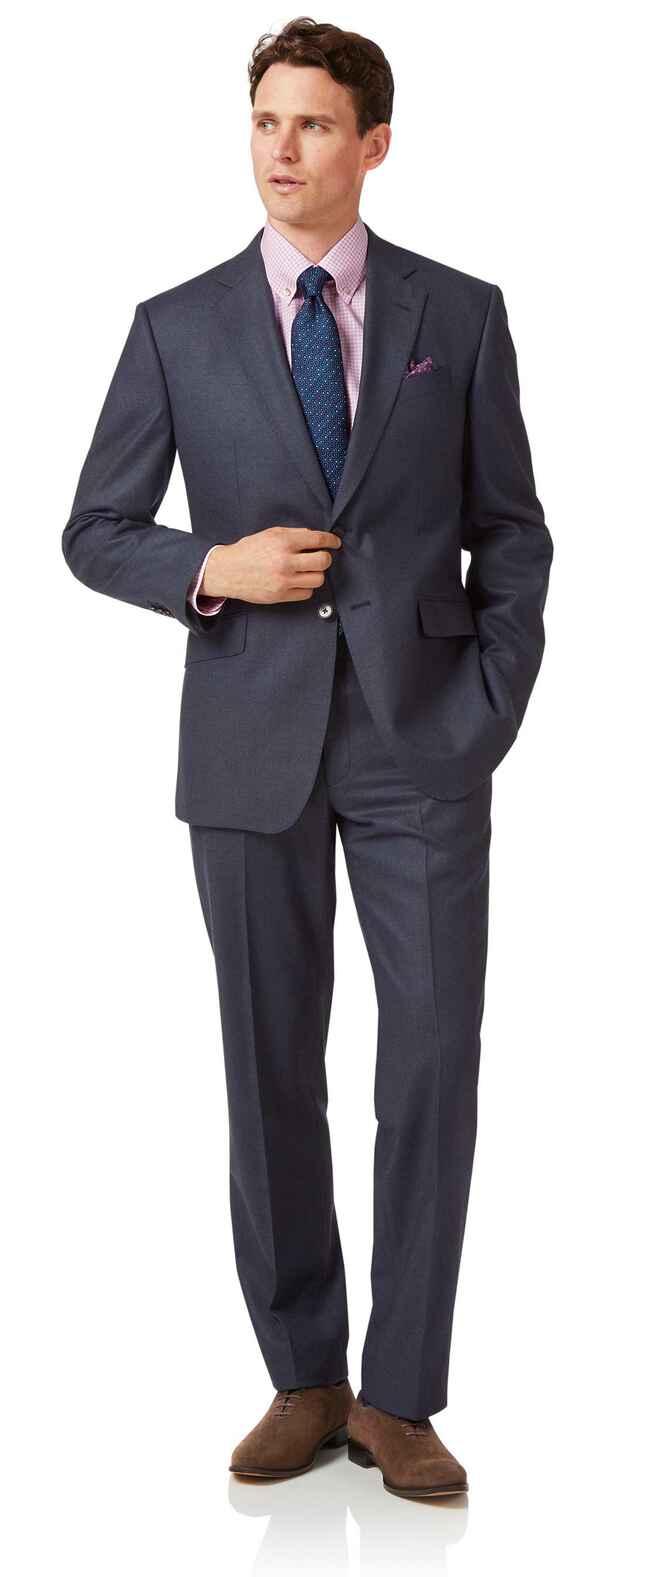 Business-Anzug Classic Fit Flanell Airforceblau